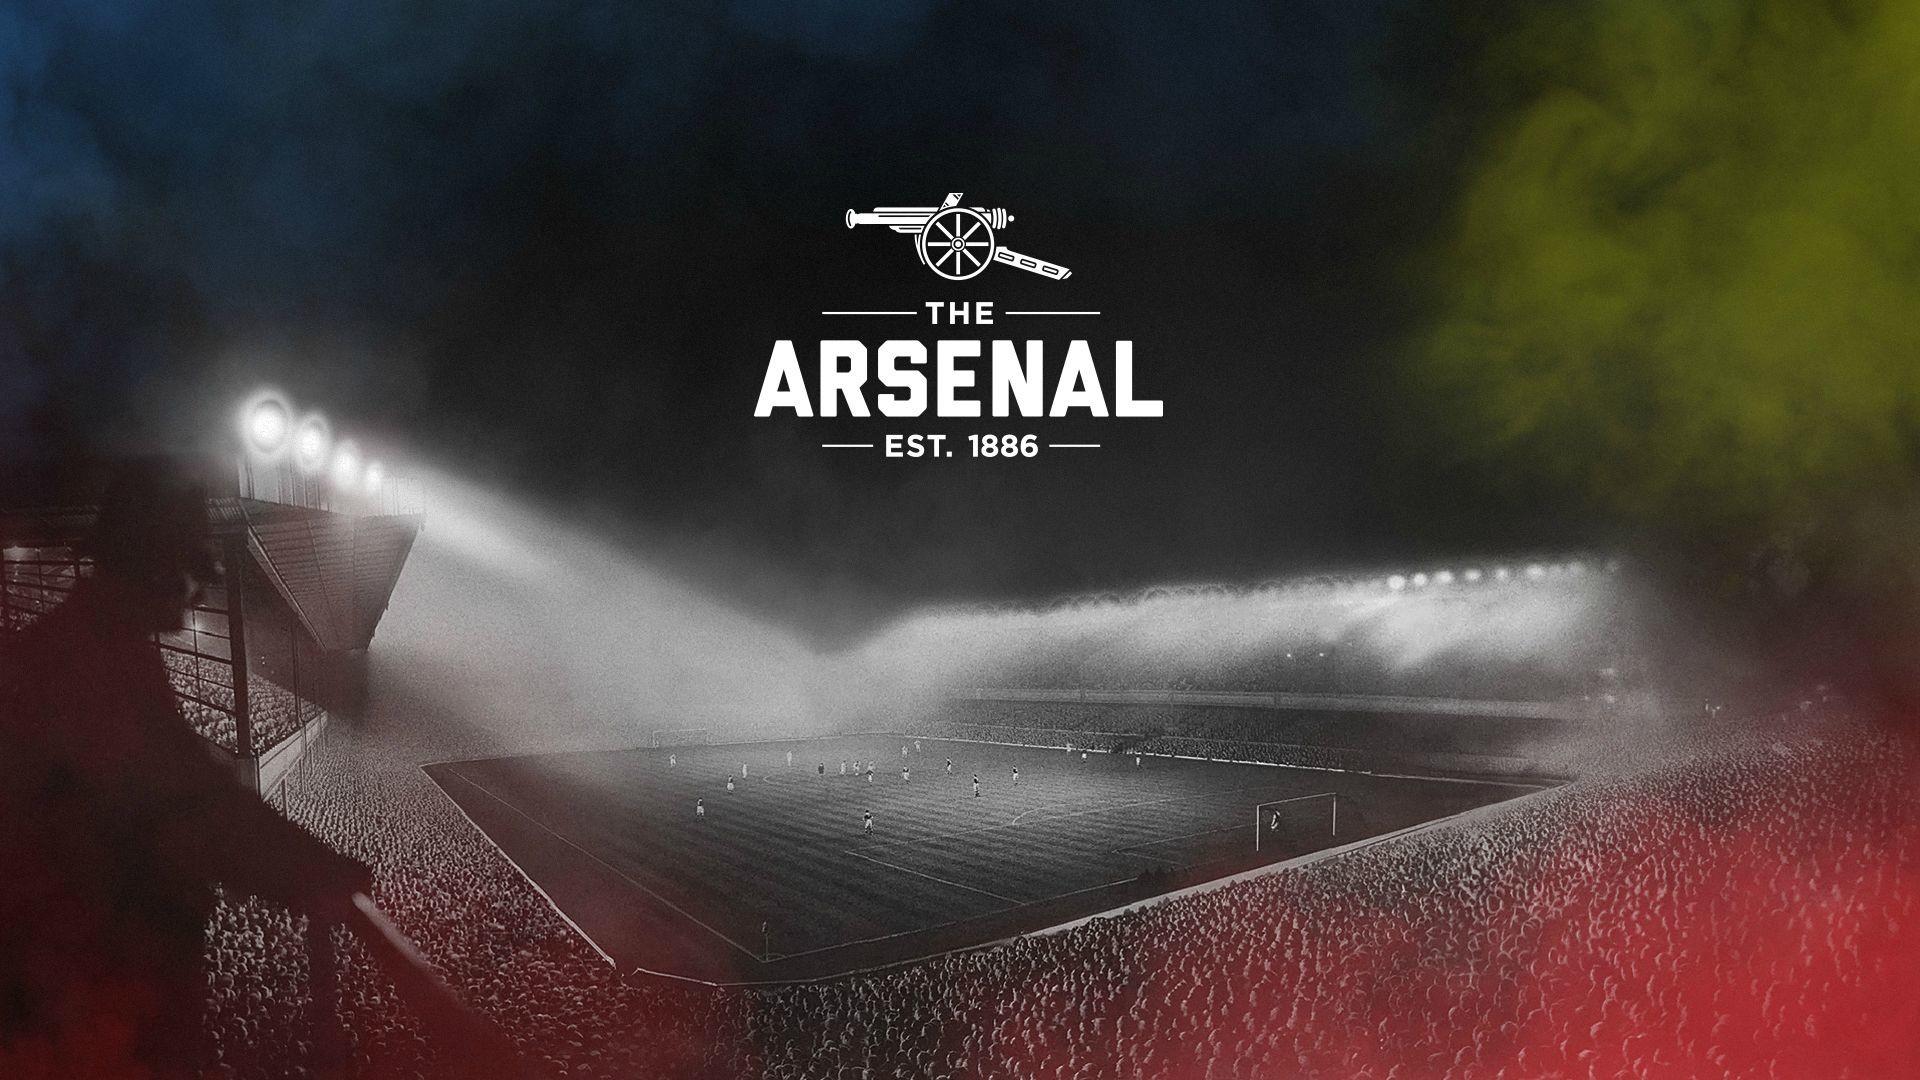 Arsenal Phone Wallpaper ① Wallpapertag